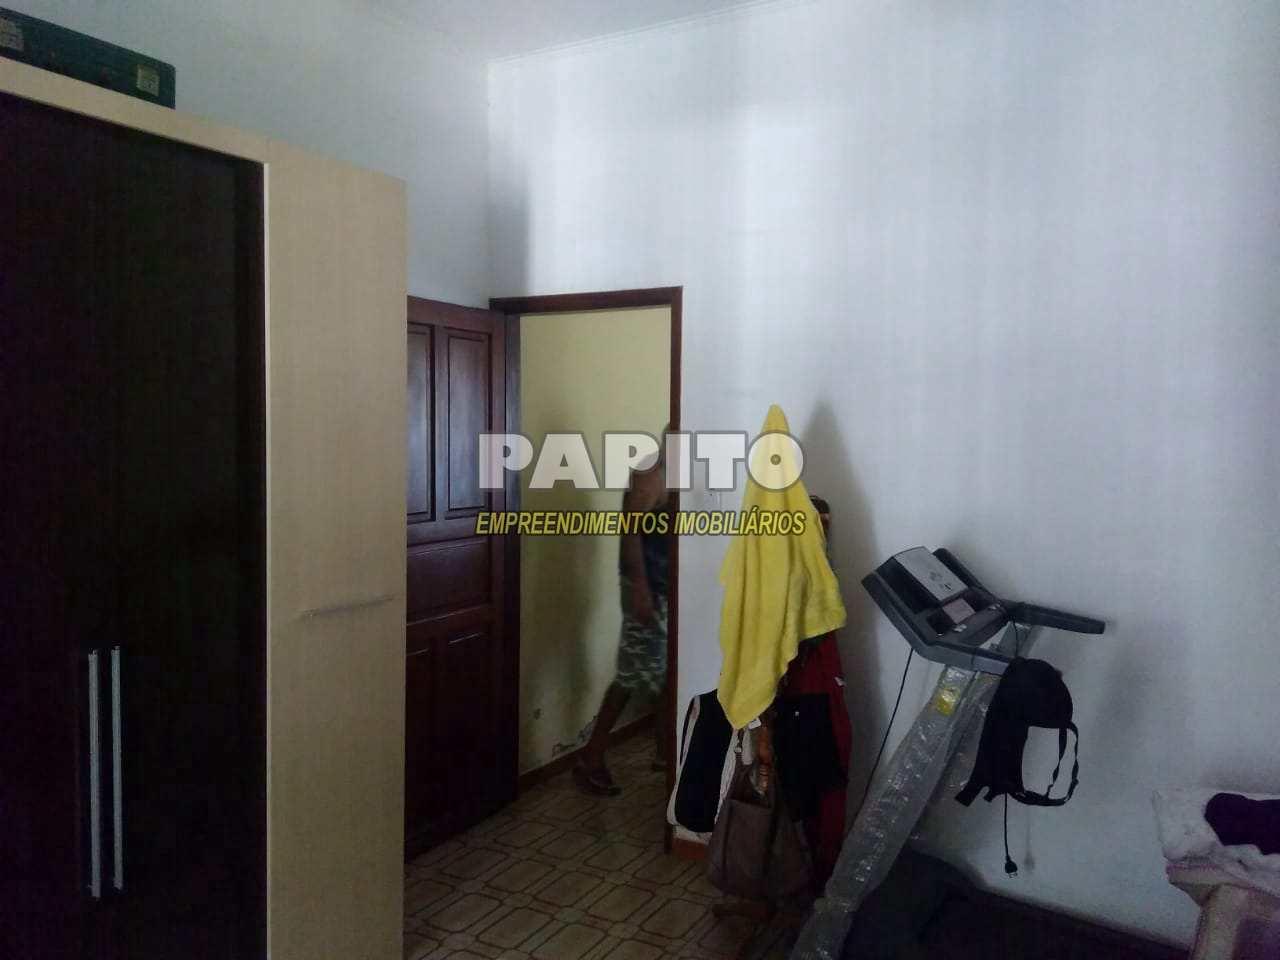 Casa com 2 dorms, Mirim, Praia Grande - R$ 250 mil, Cod: 60011311